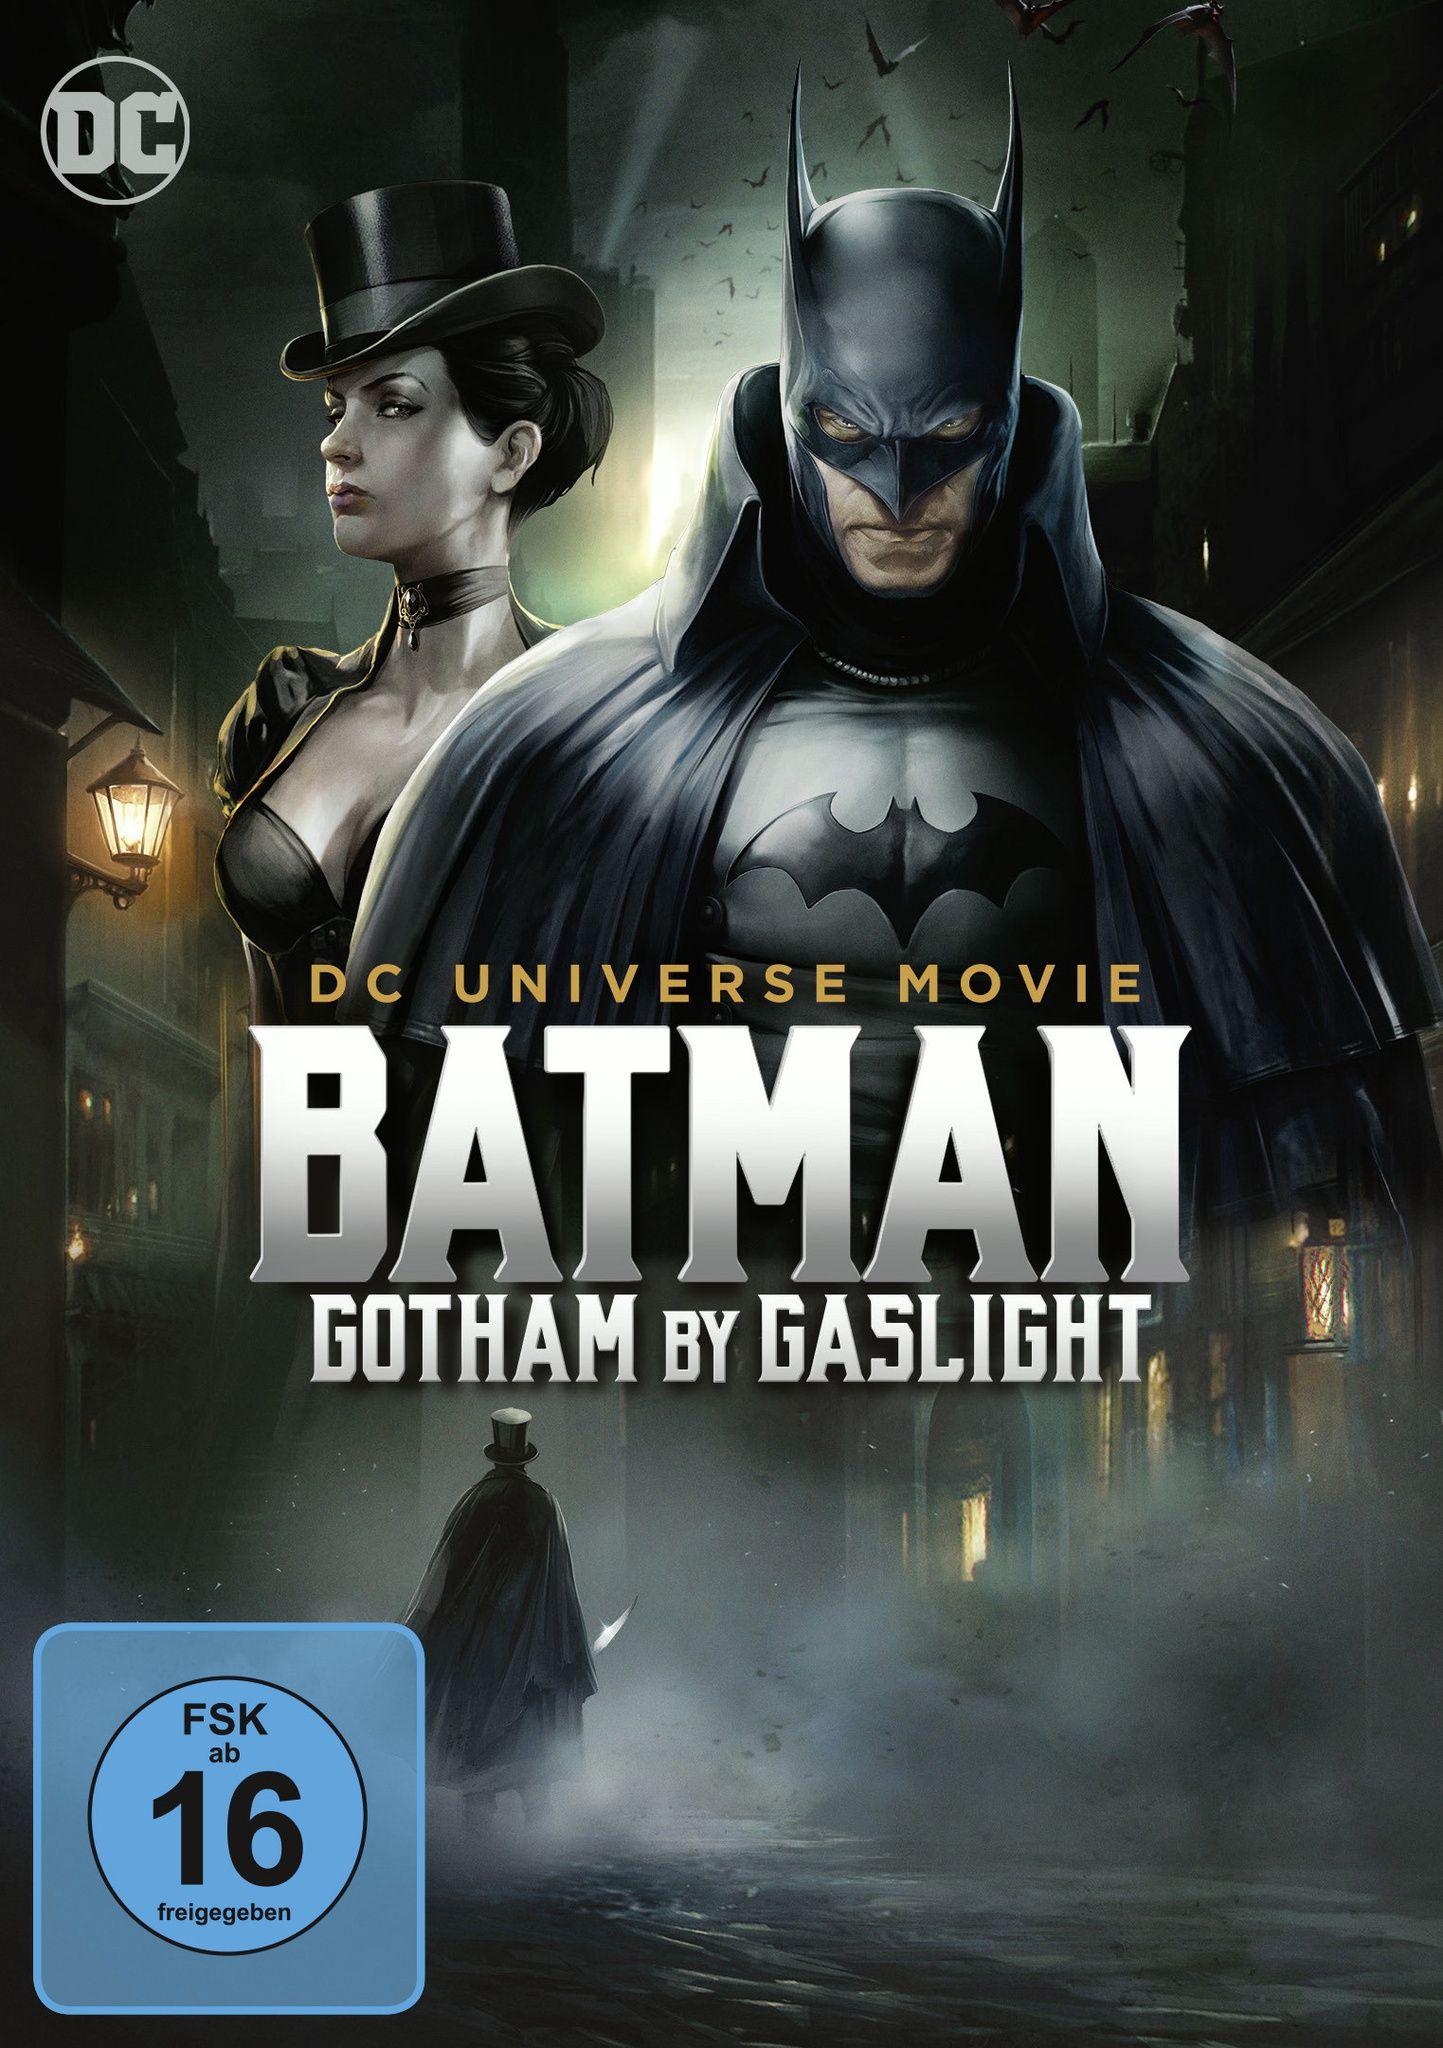 Batman Gotham By Gaslight Dvd Blu Ray Oder Vod Leihen Videobuster De Gotham Films Gratuits En Ligne Film Streaming